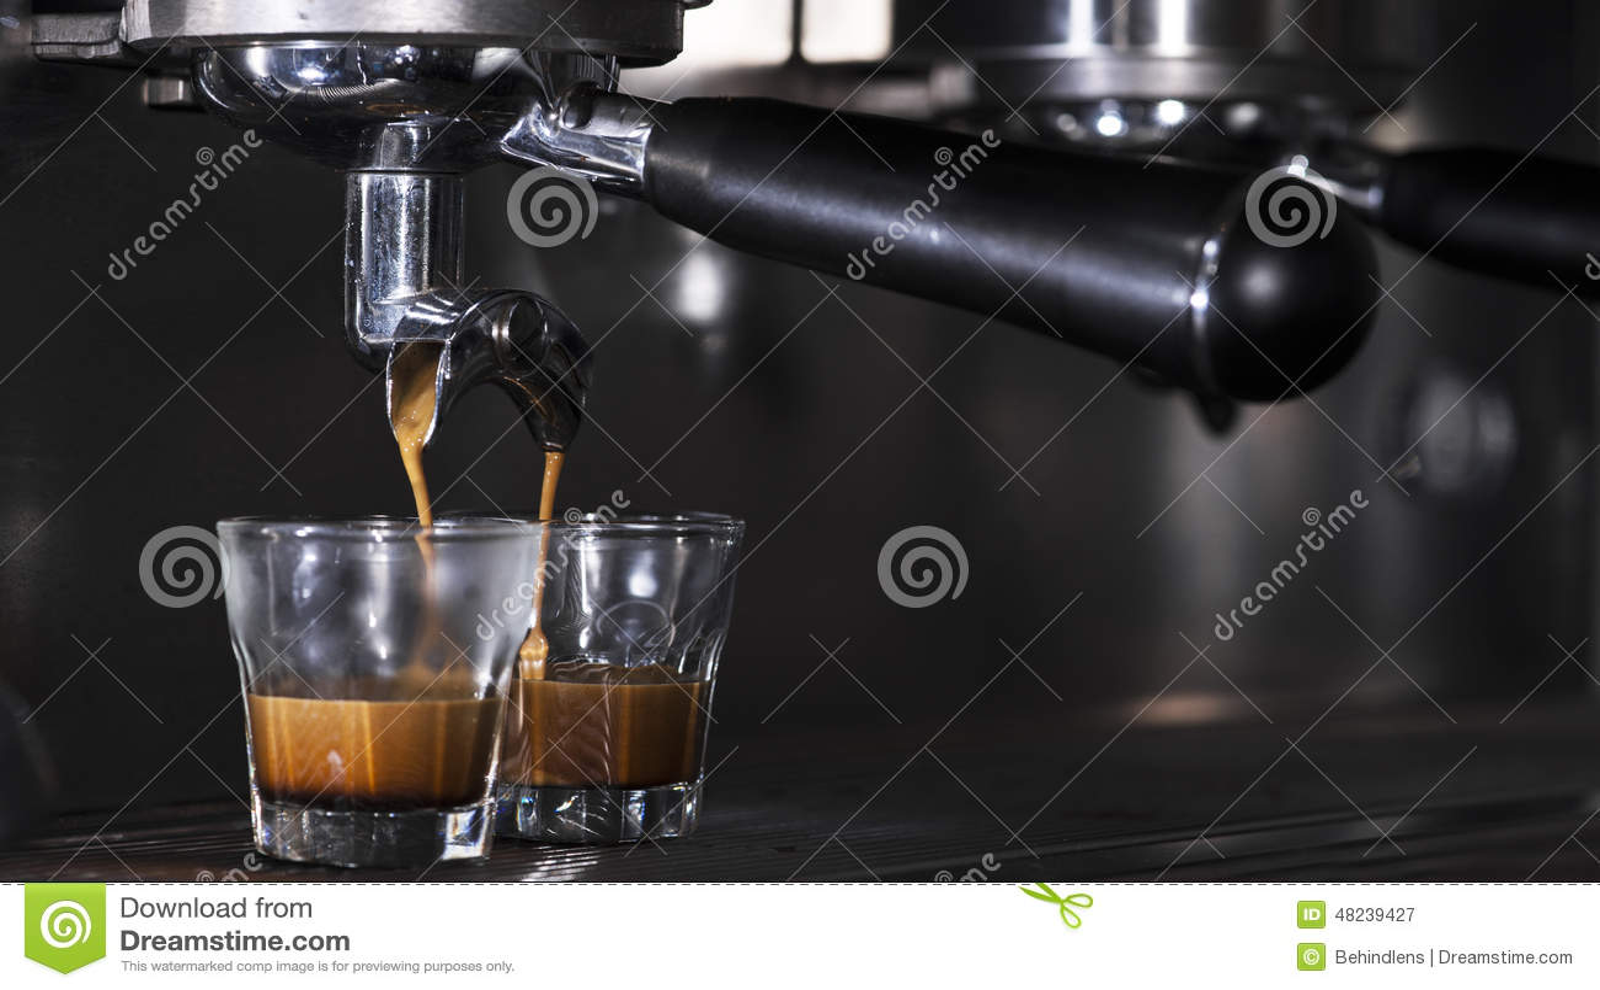 prepares espresso in his coffee shop stock photo image 48239427. Black Bedroom Furniture Sets. Home Design Ideas